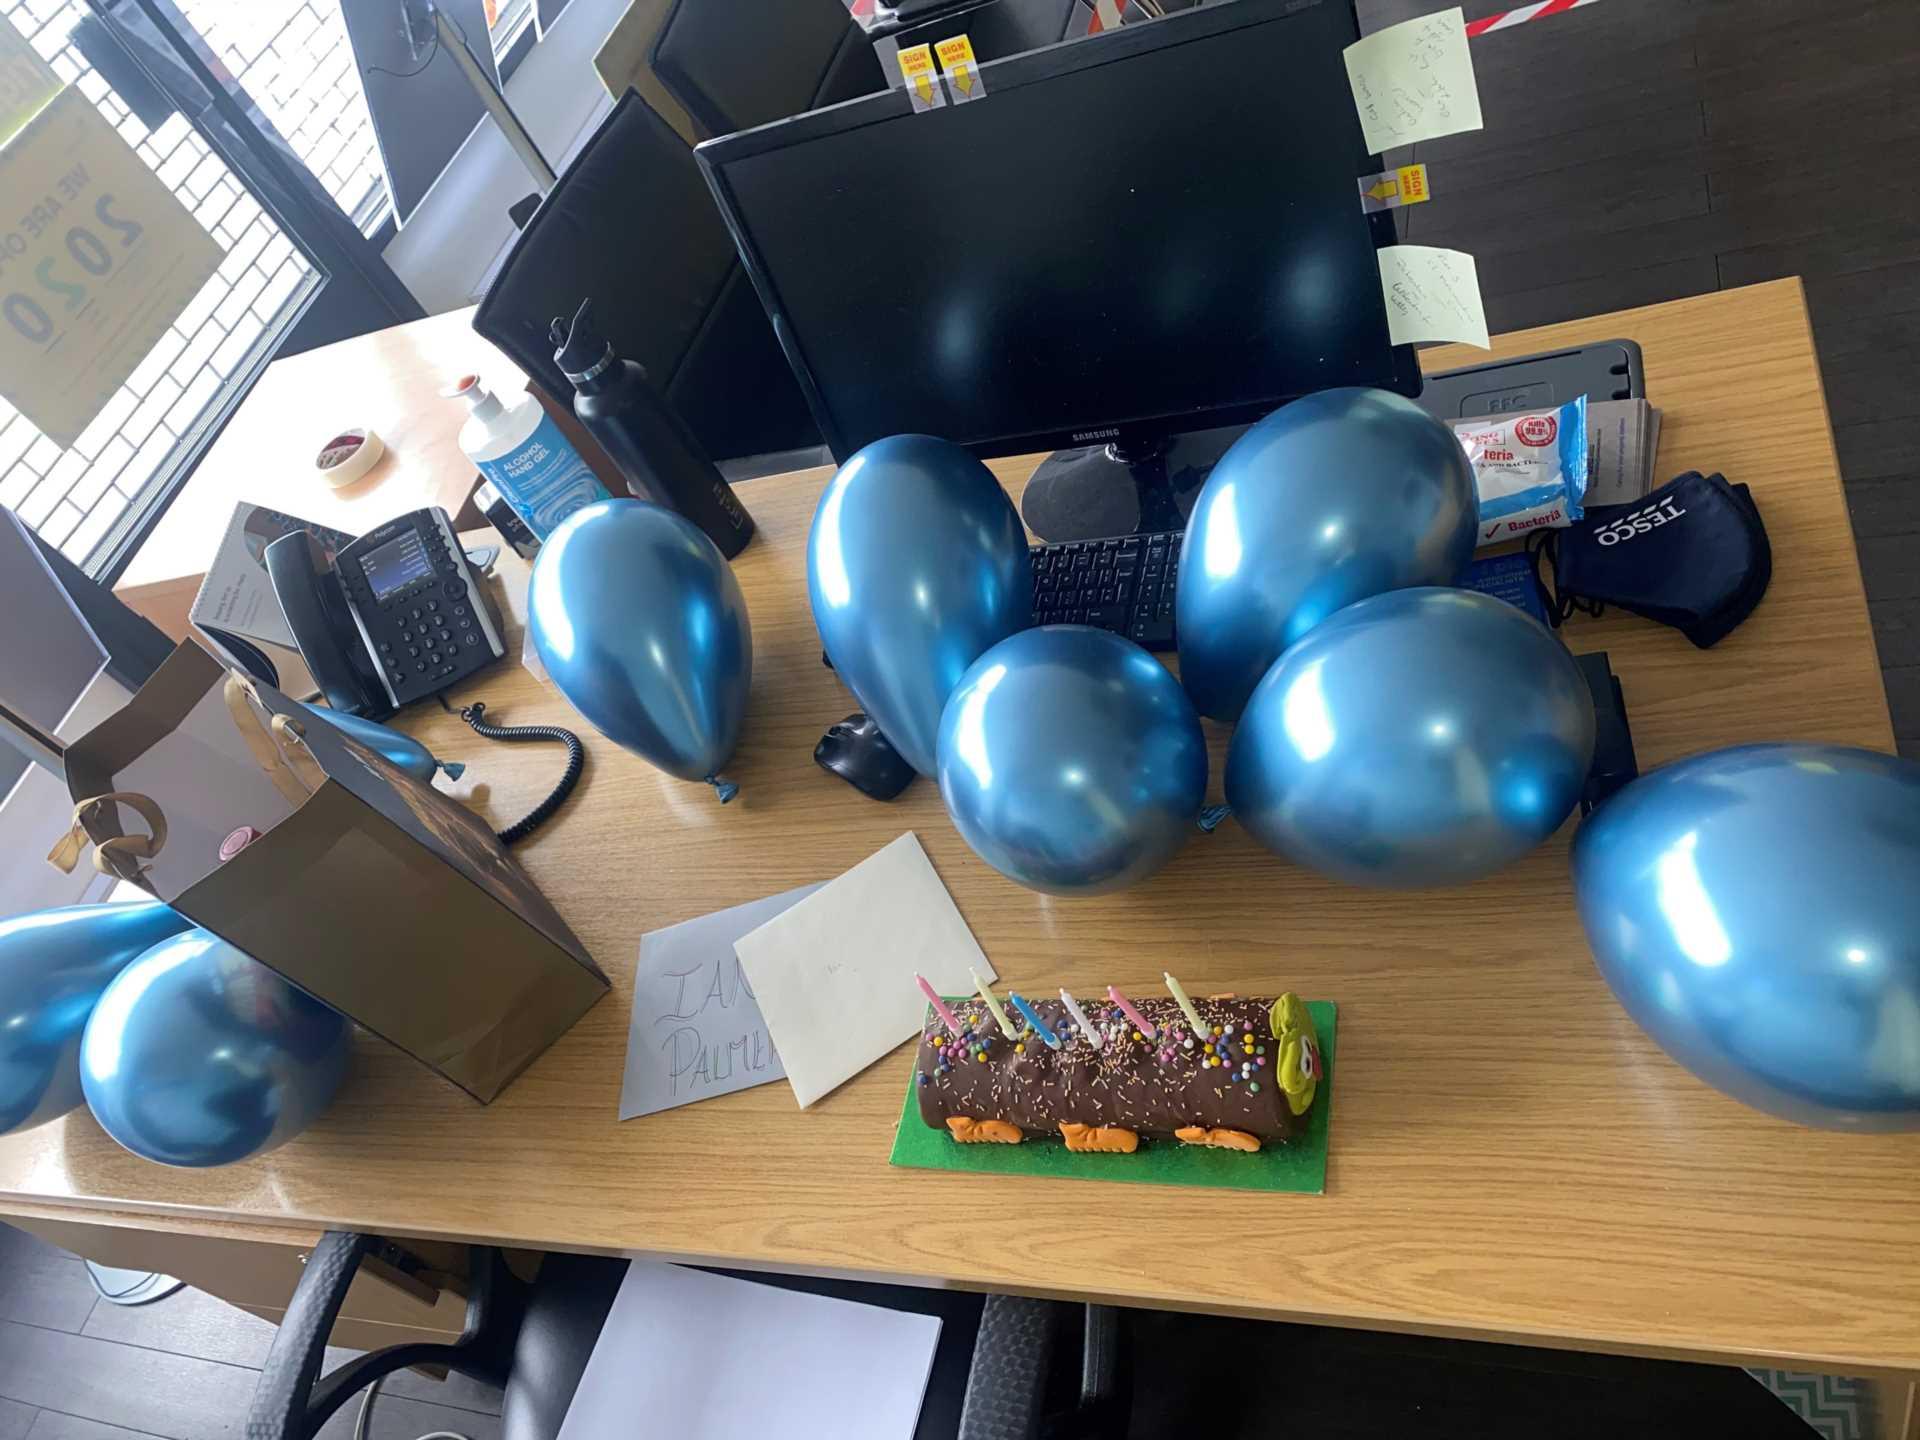 Wishing our Ian palmer a happy birthday!